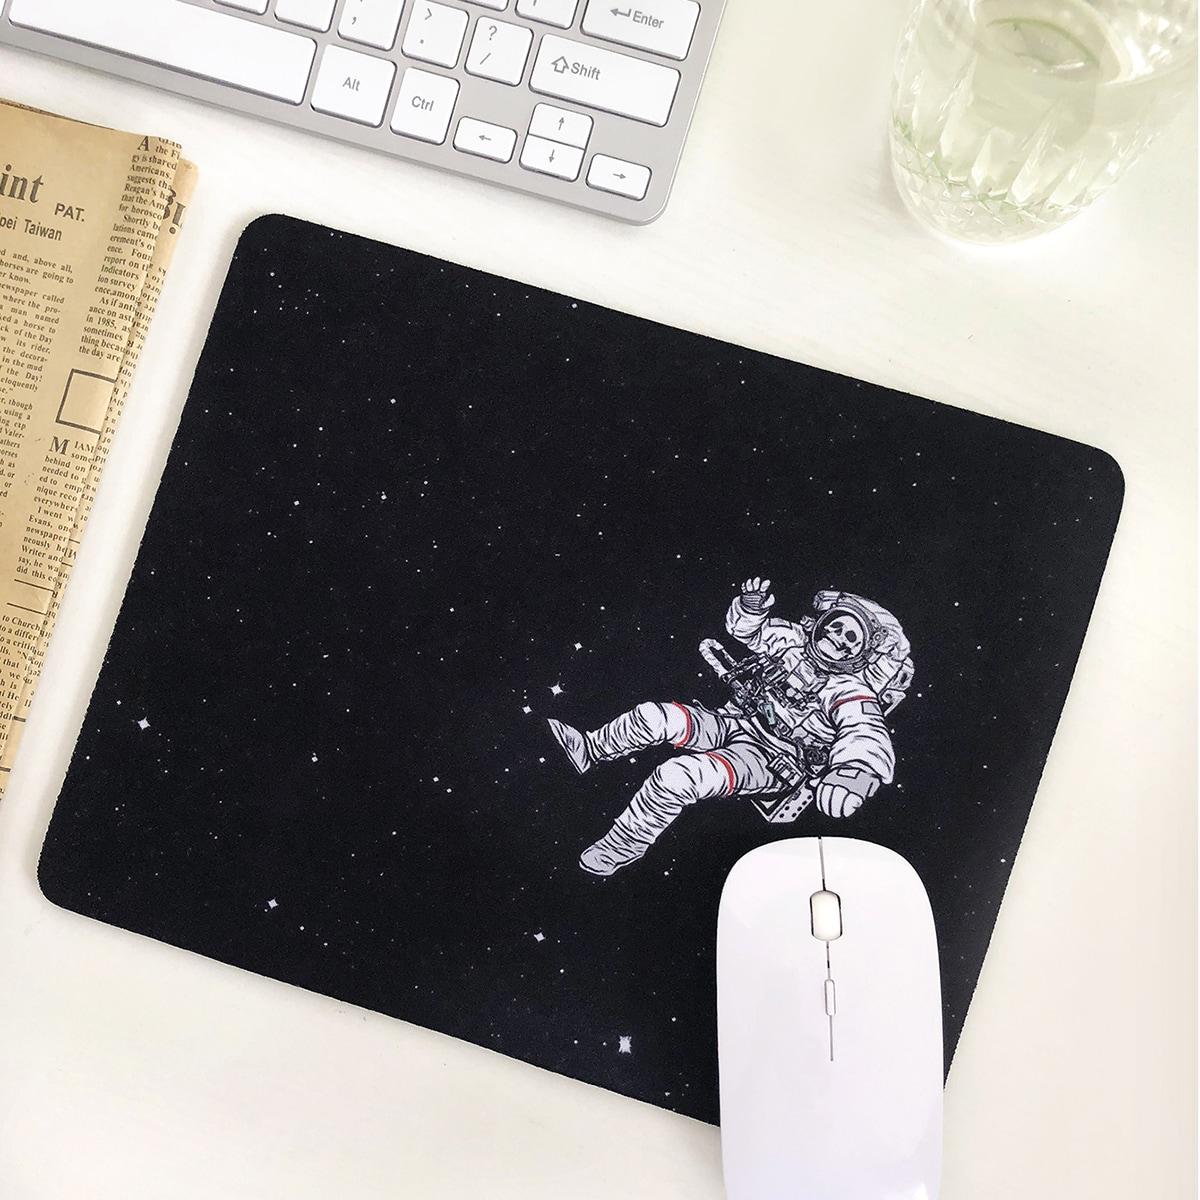 Mauspad mit Astronaut Muster